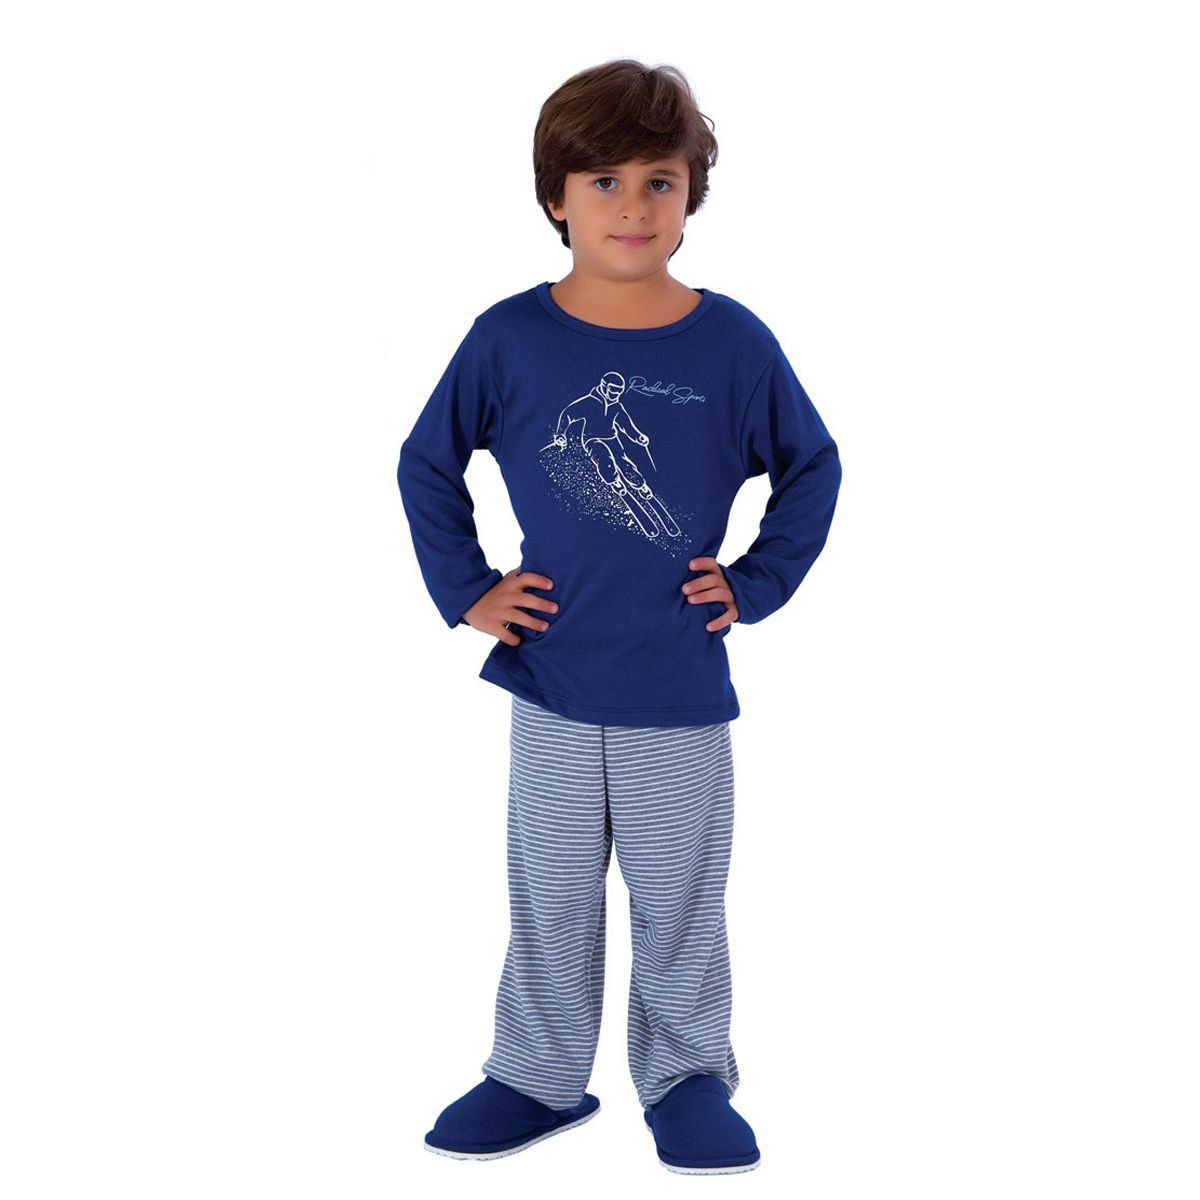 Pijama infantil para meninos de inverno canelado Victory